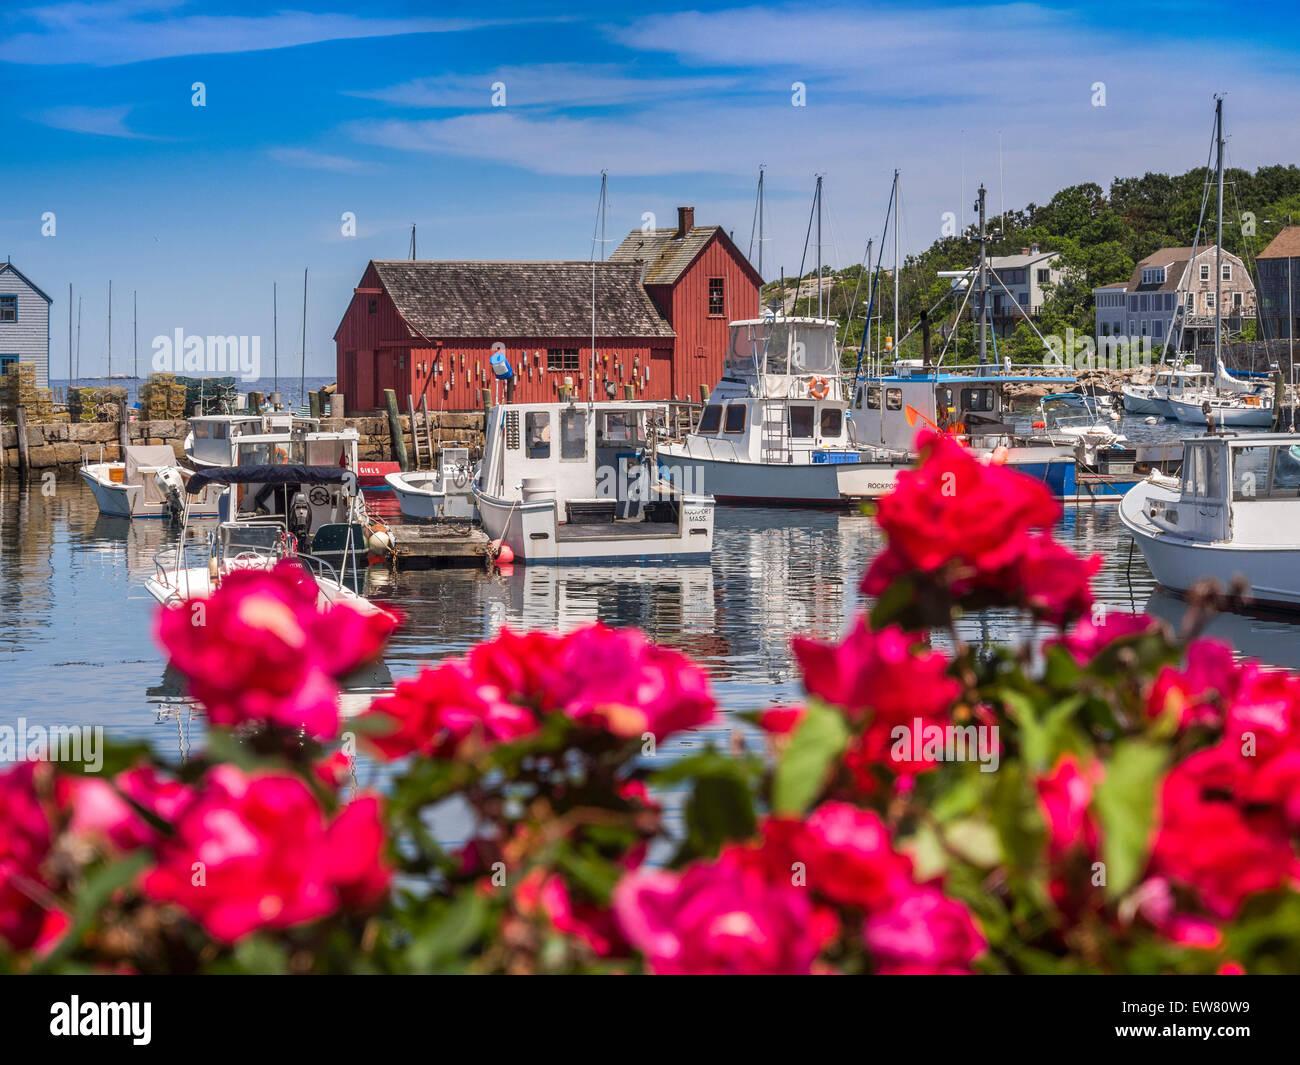 New England fishing village. Motif #1, fisherman's shack in Rockport harbor, massachusetts, USA - Stock Image